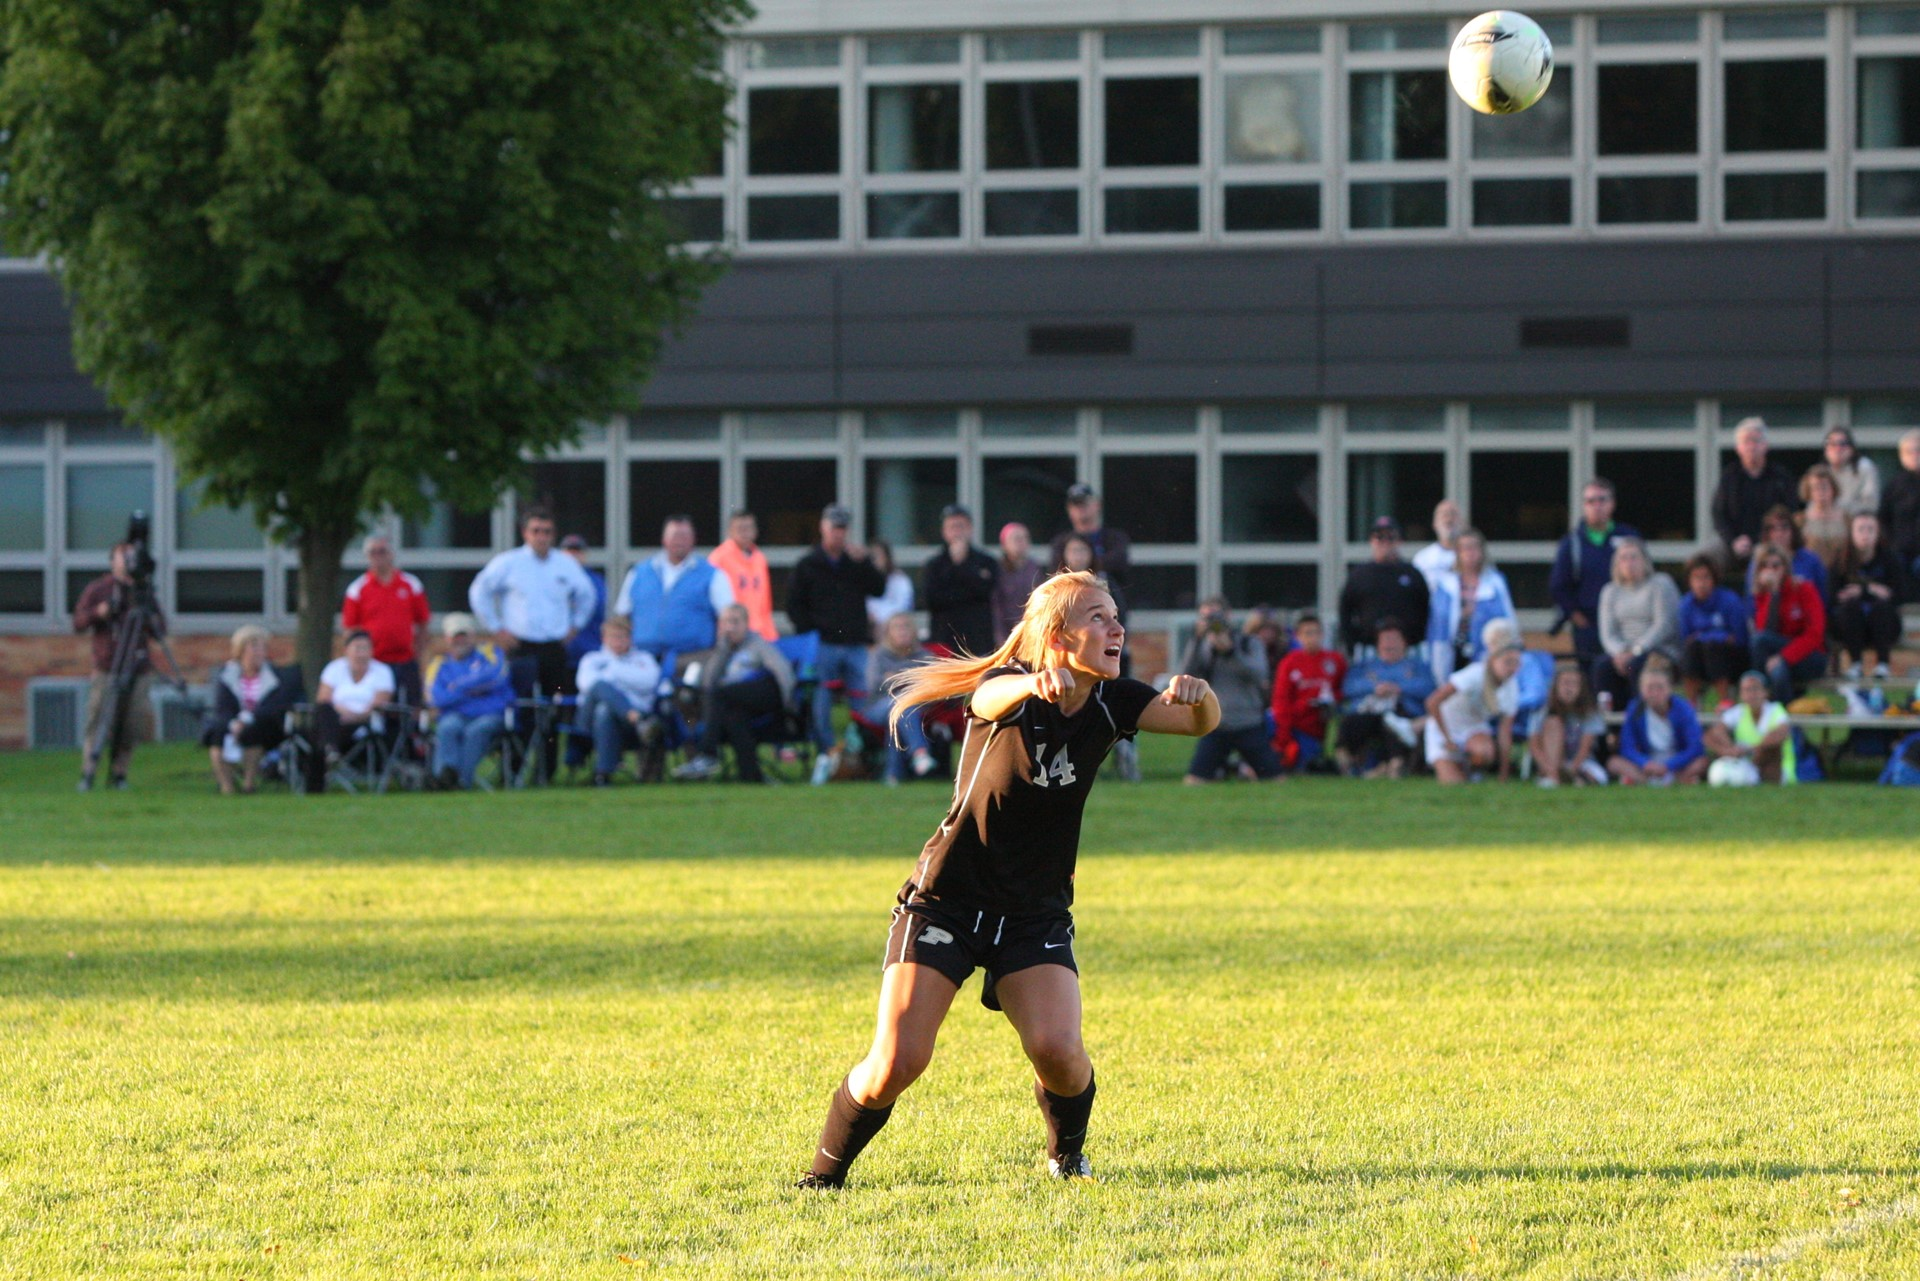 PHS student athlete heading a soccer ball